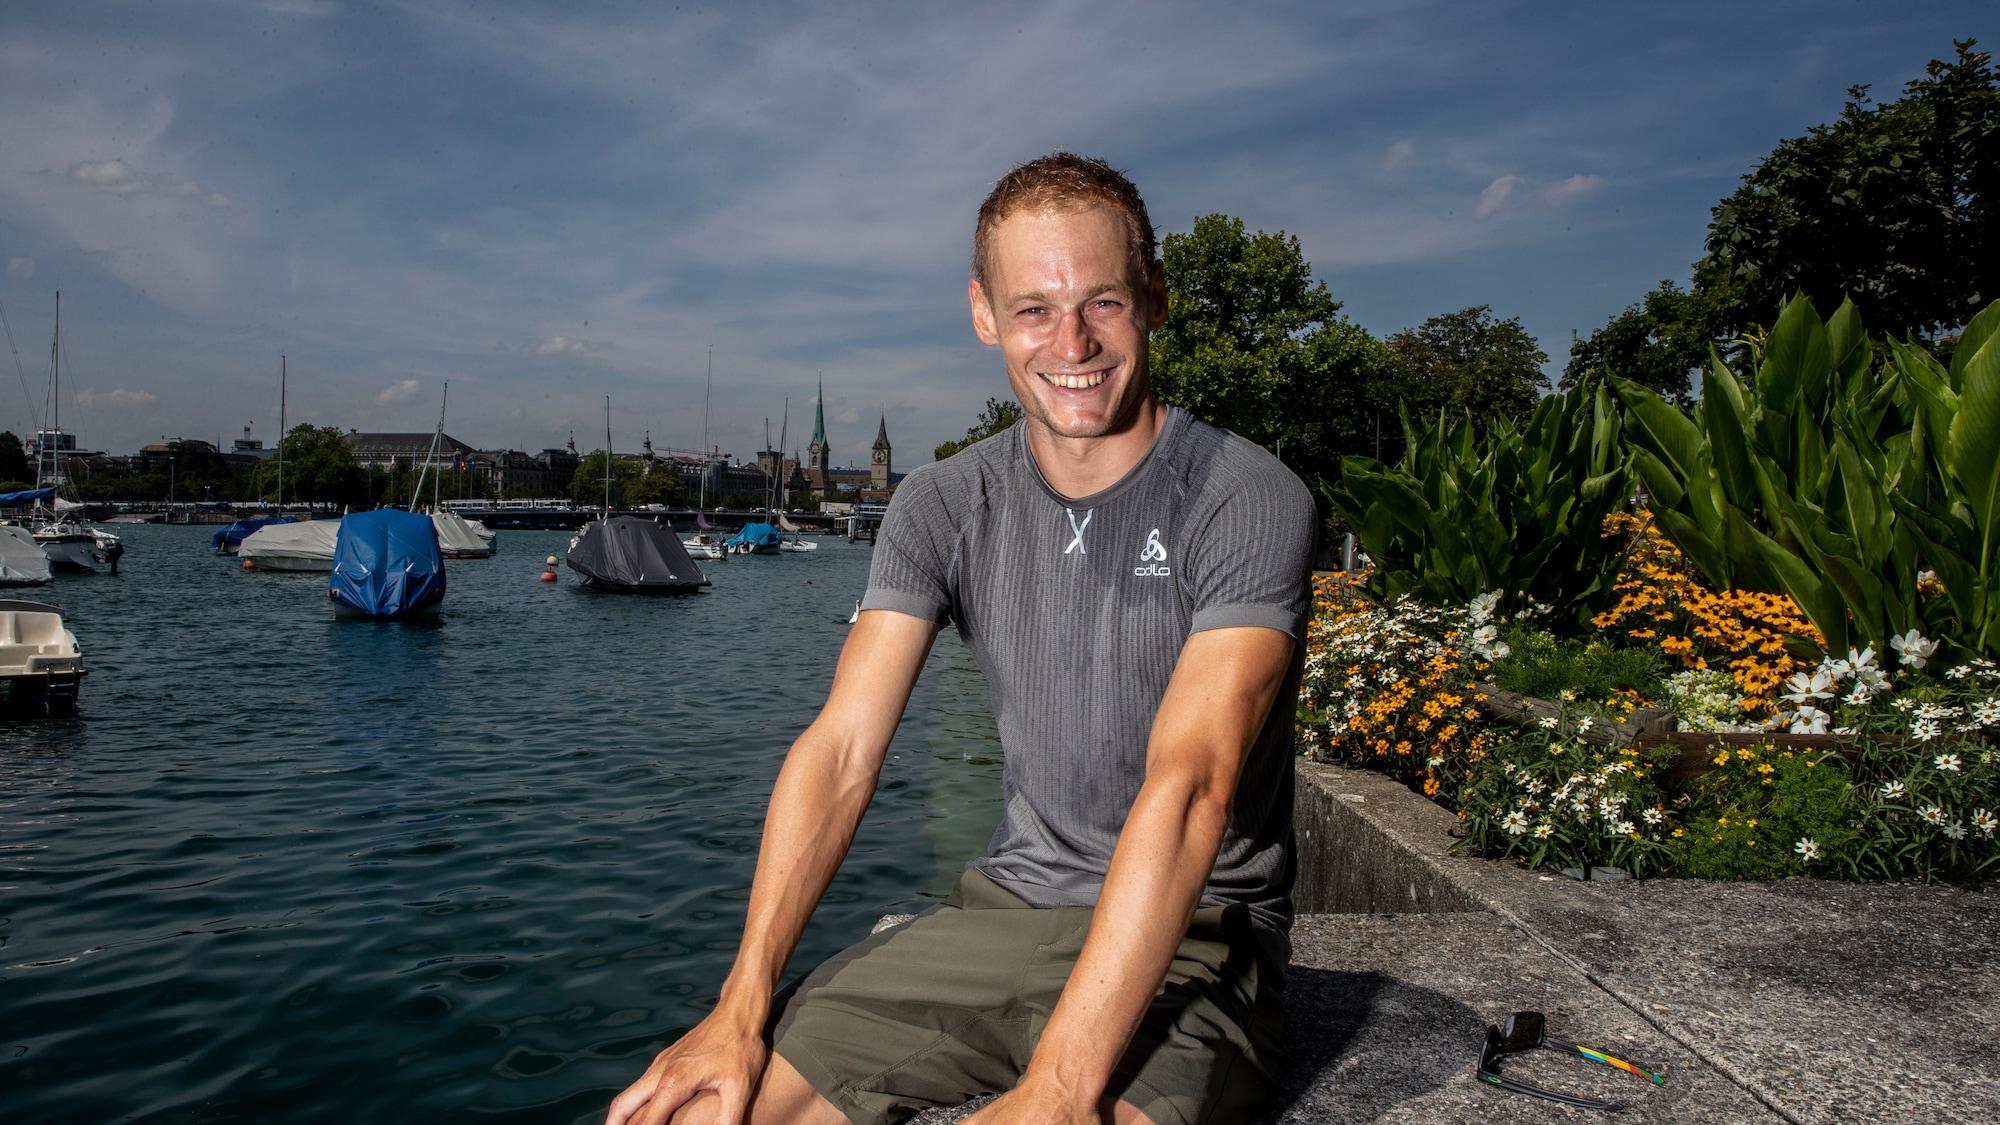 Letztes Mal Ironman in Zürich: König Van Berkel hat den Papi-Kick